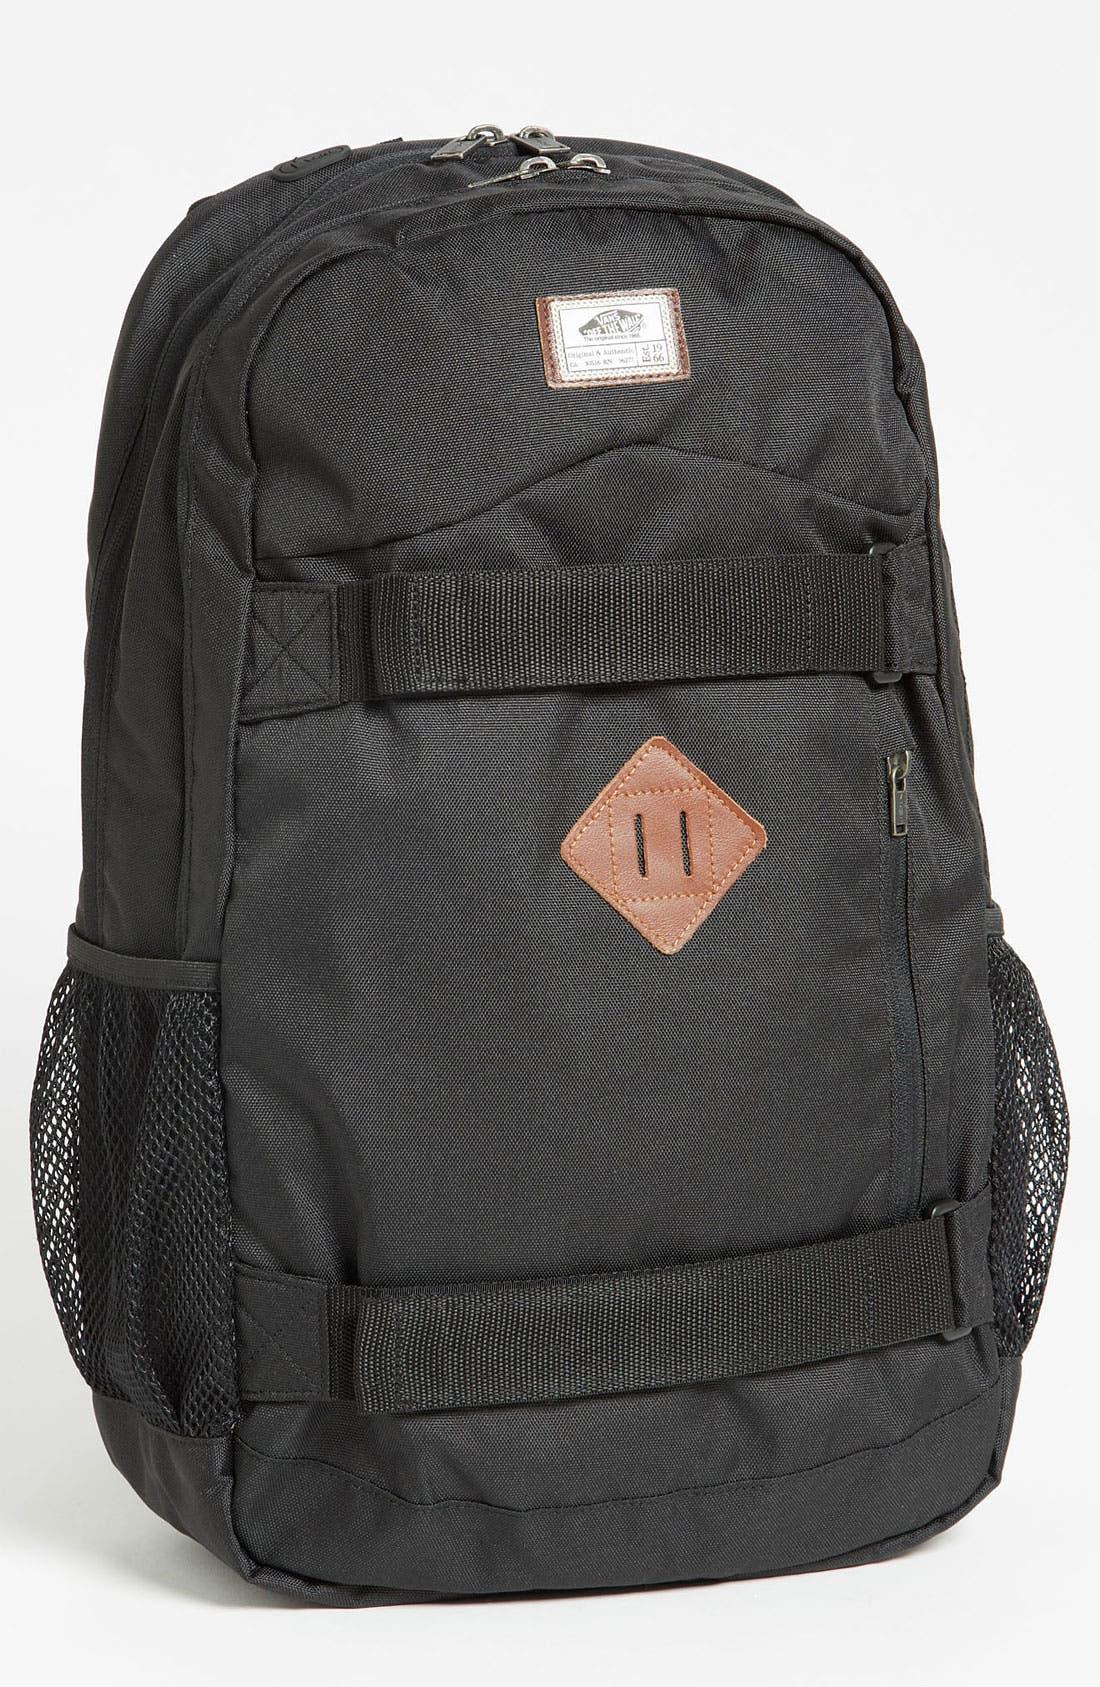 Alternate Image 1 Selected - Vans 'Skatepack' Backpack